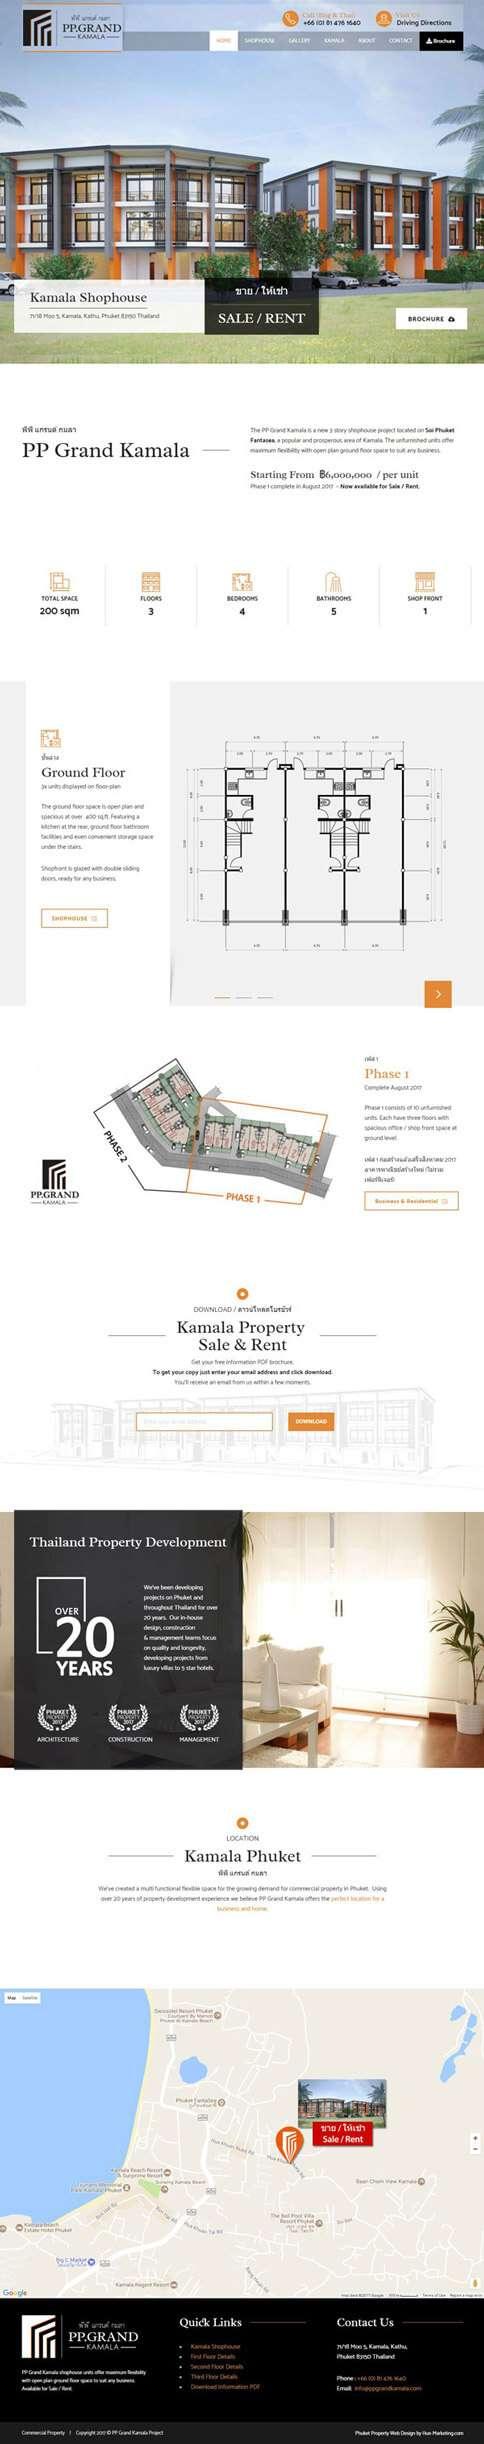 Home Page PP Grand Kamala Phuket Property